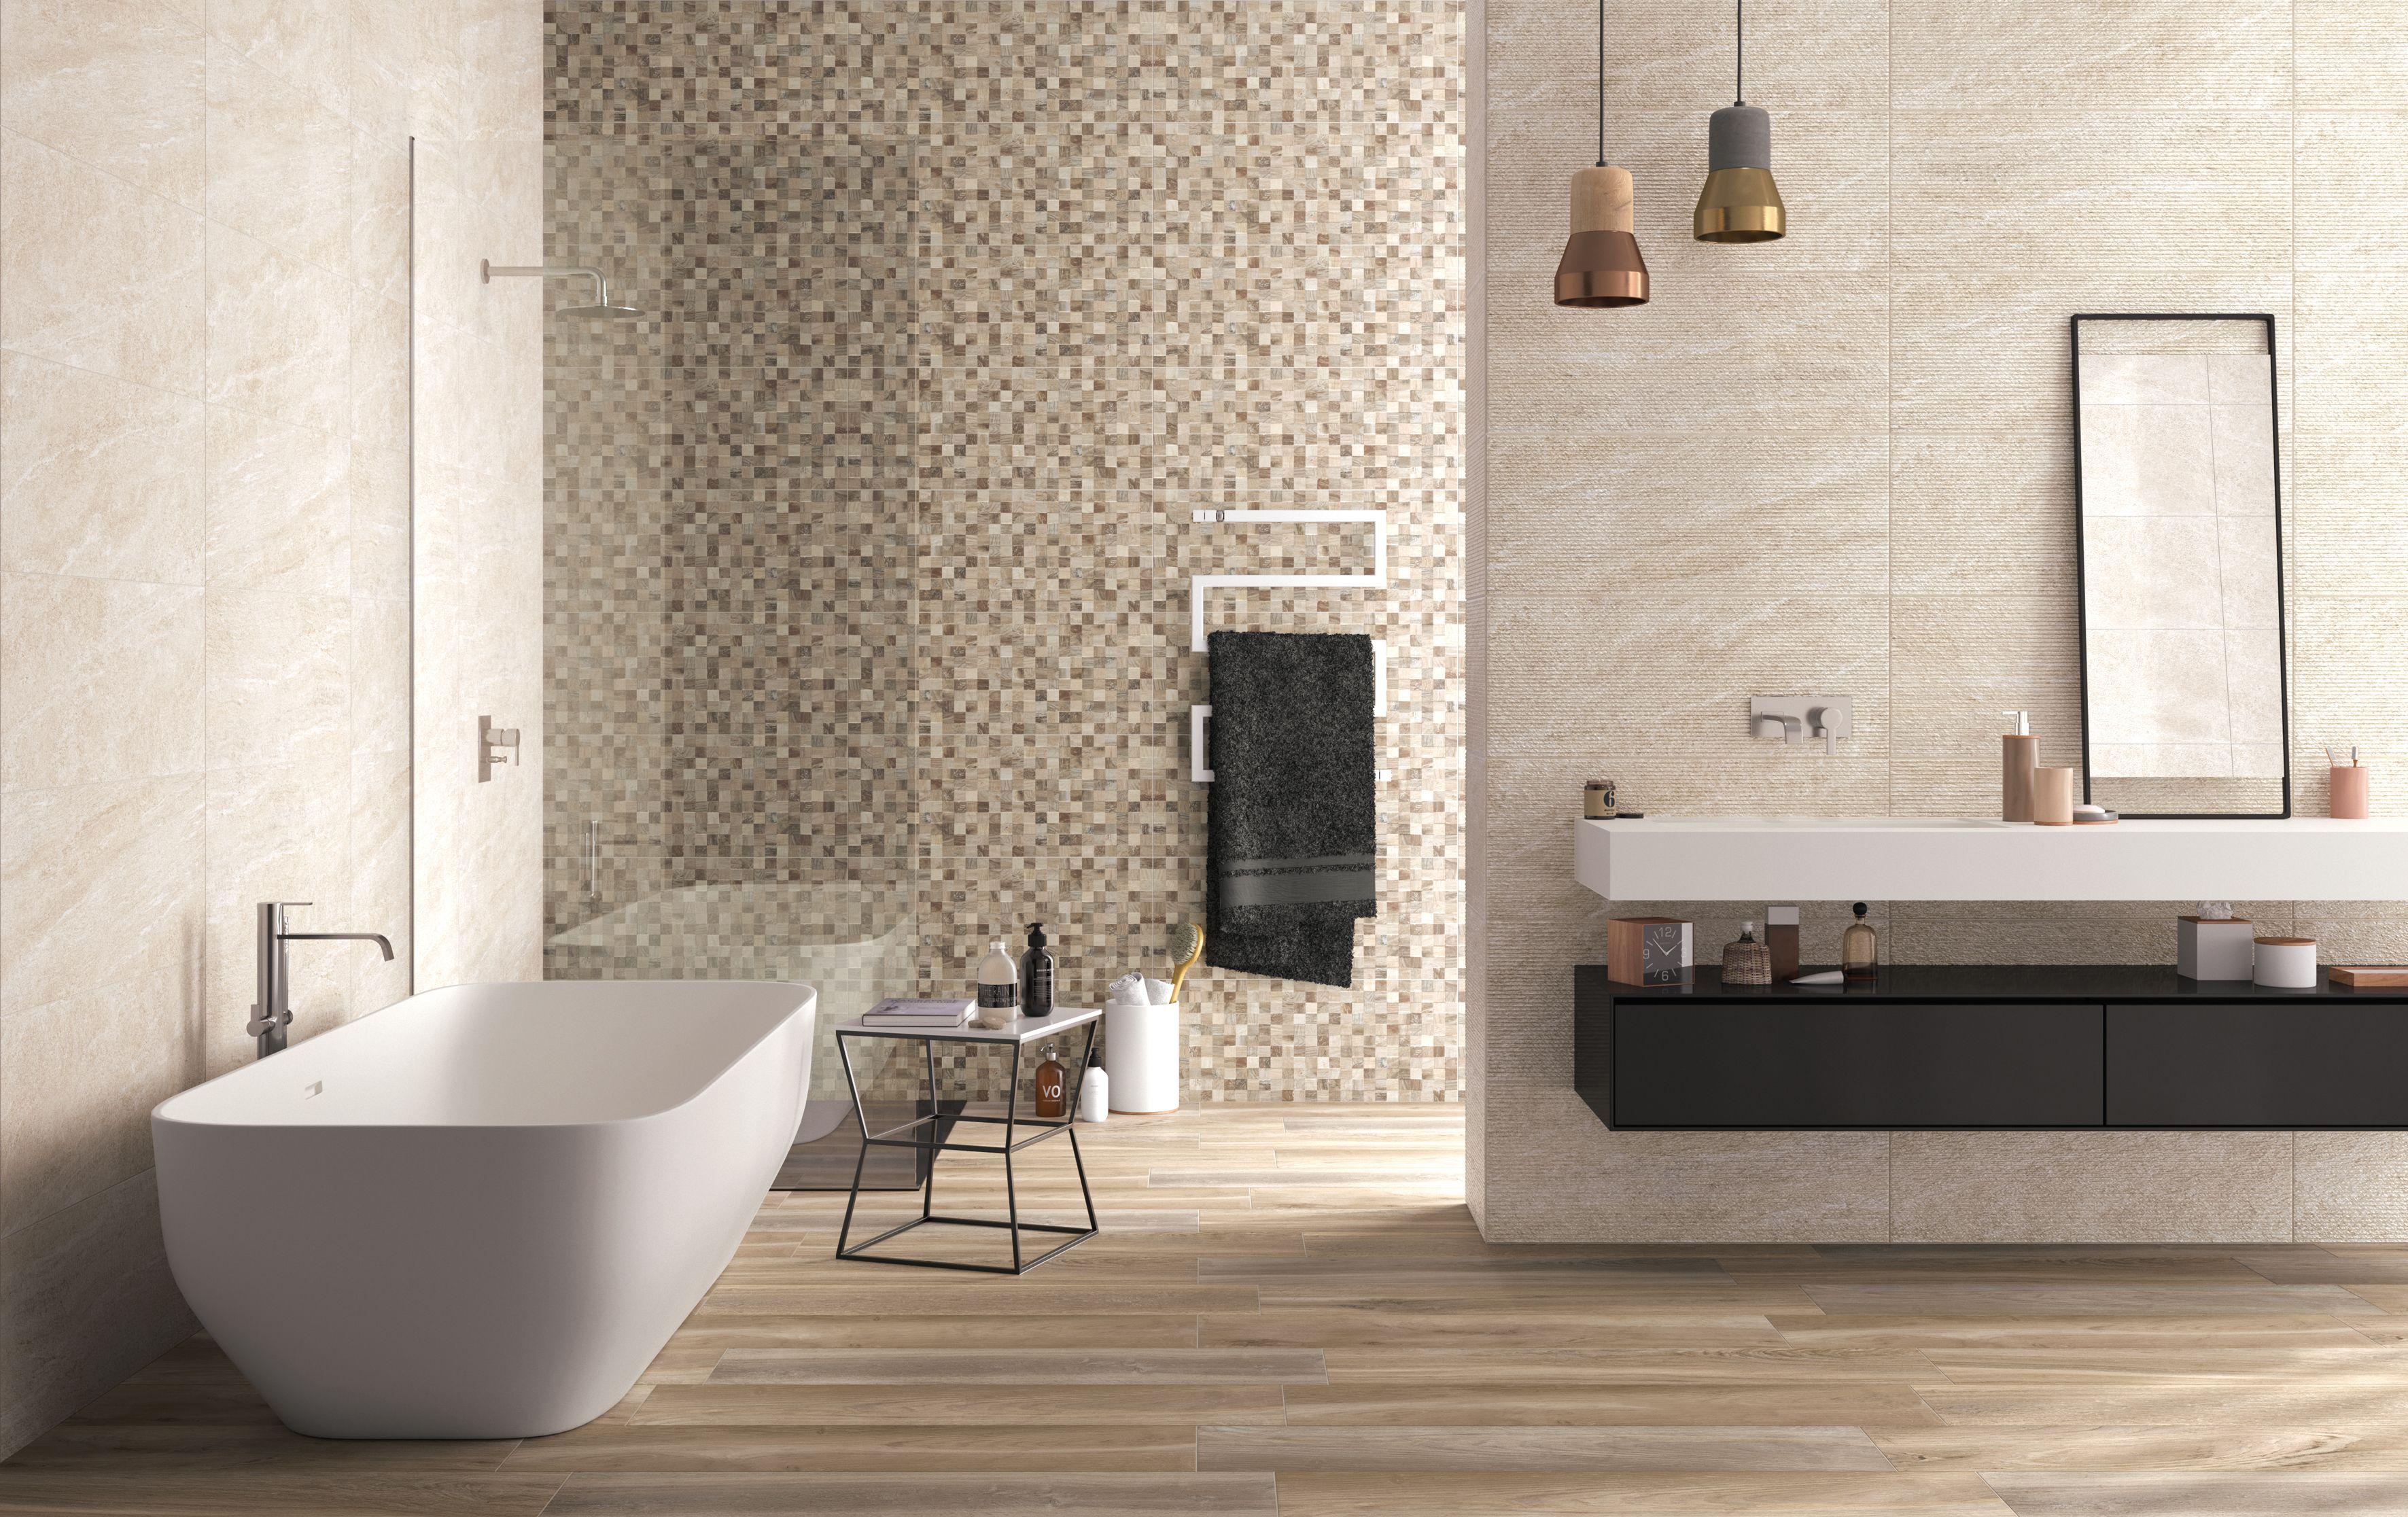 Carrelage Mural Salle De Bain Frazzi ~ carrelage salle de bain d cor effet pierre rub 32×80 5 lias naturel